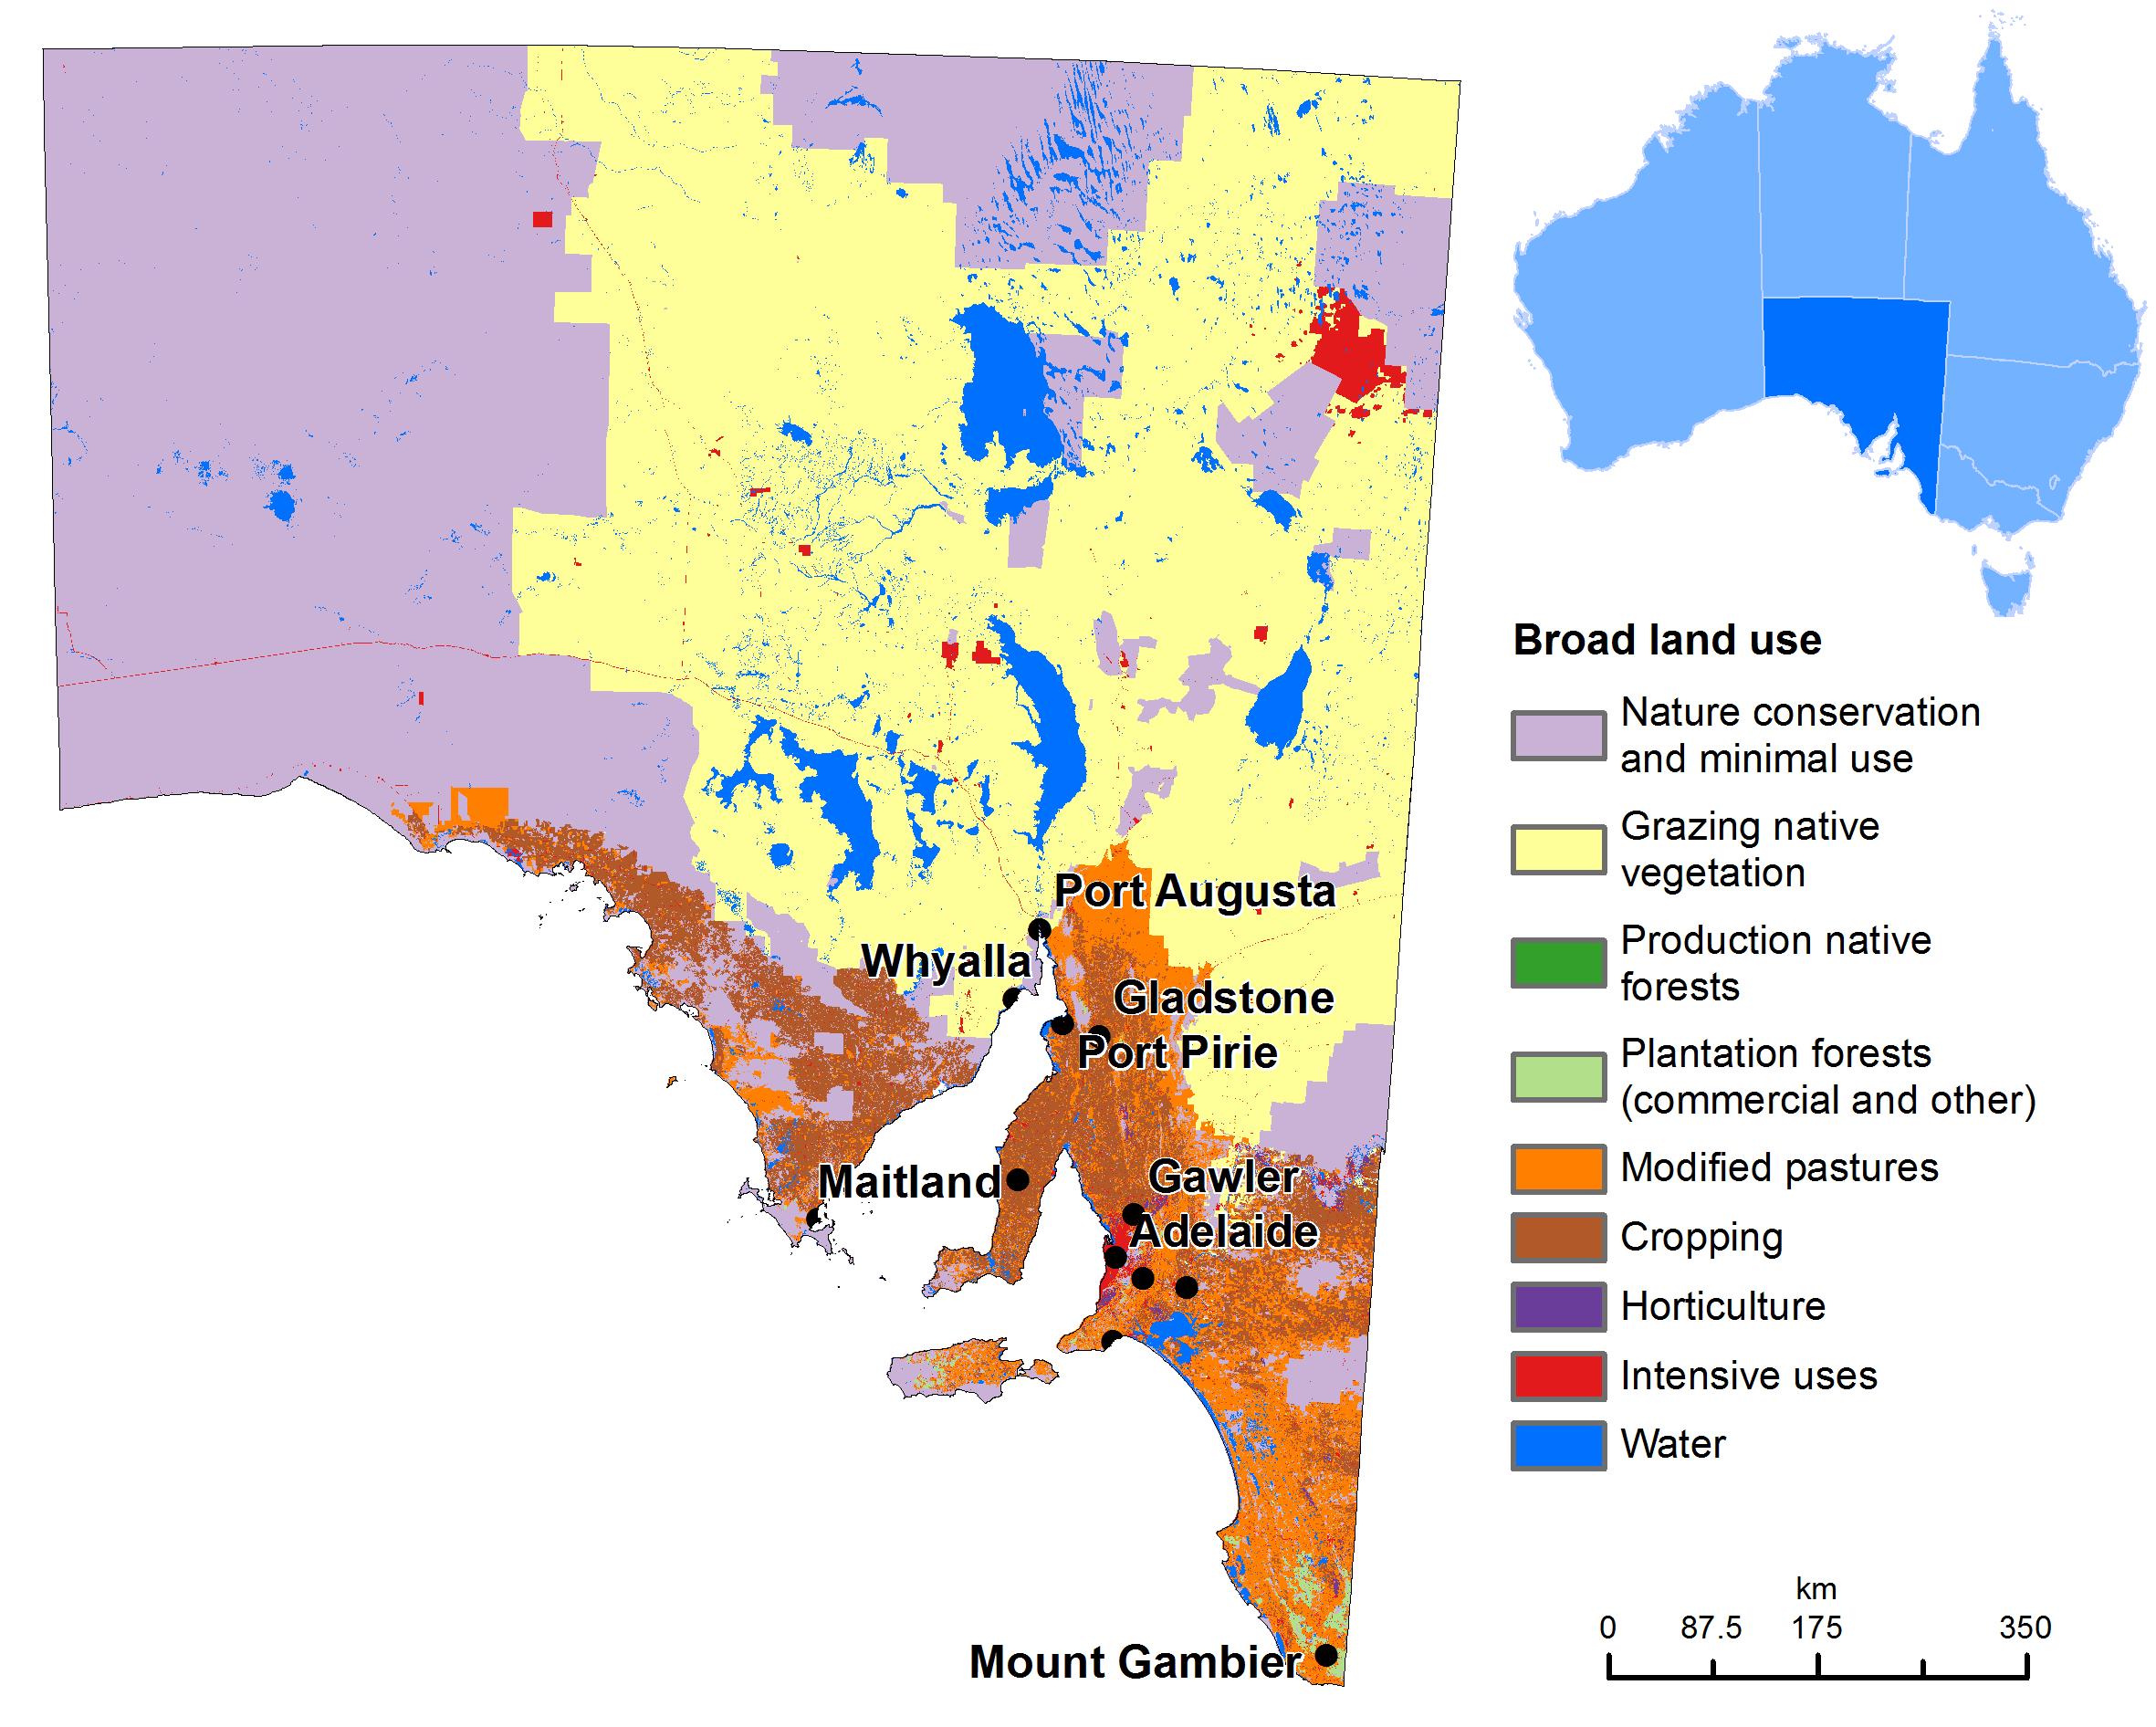 Australia Land Map.Land Use Map Of South Australia Australia Pacific Australia Map